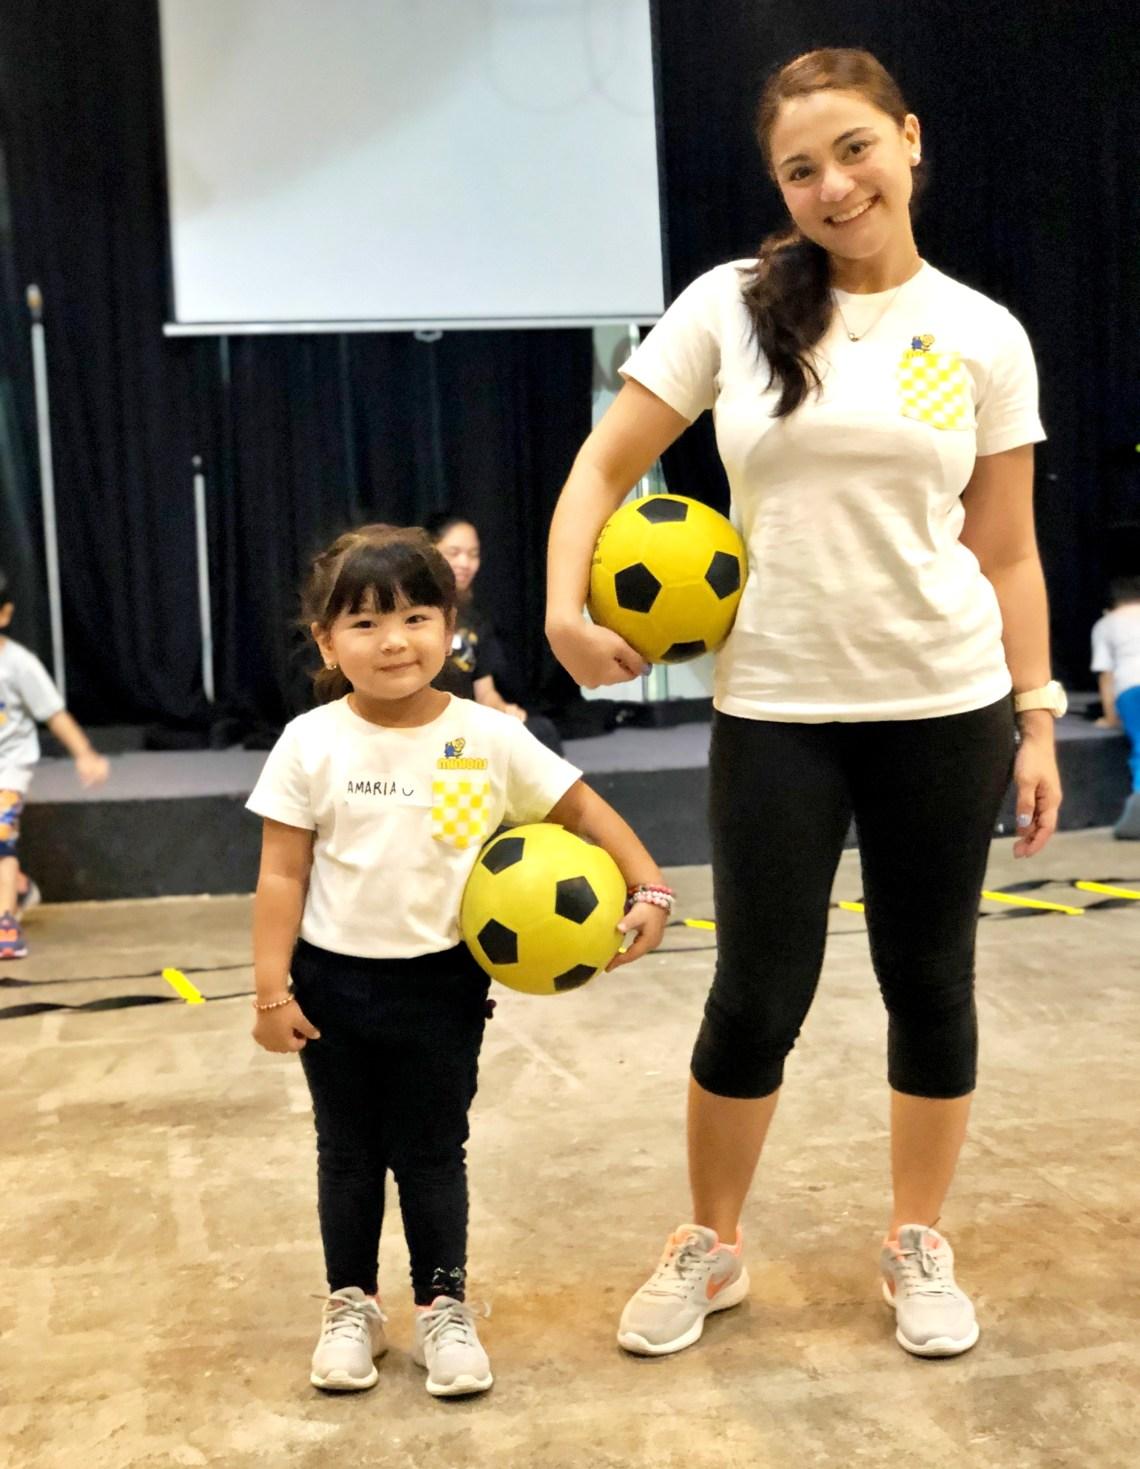 dyosathemomma: Ready Steady Go Kids, RSGK, multi-sports summer program activity for kids, Amaria Niszha, AmariaNish